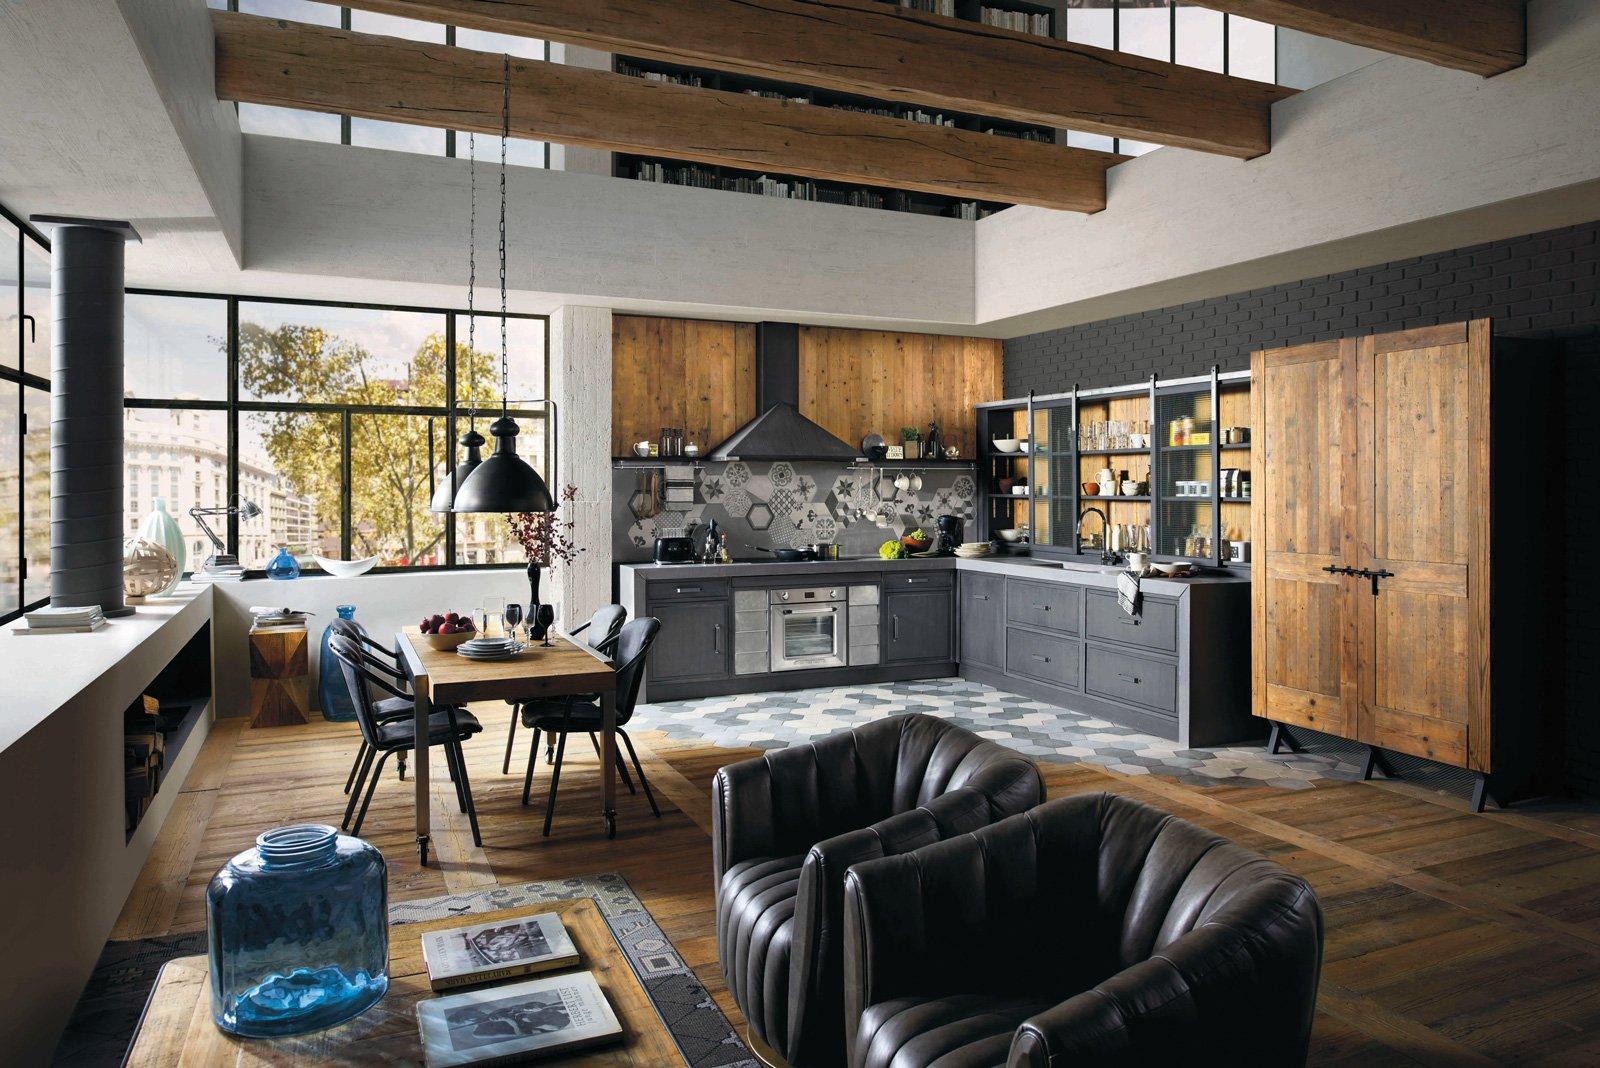 cucine in stile industriale materiche e vissute cose di casa. Black Bedroom Furniture Sets. Home Design Ideas